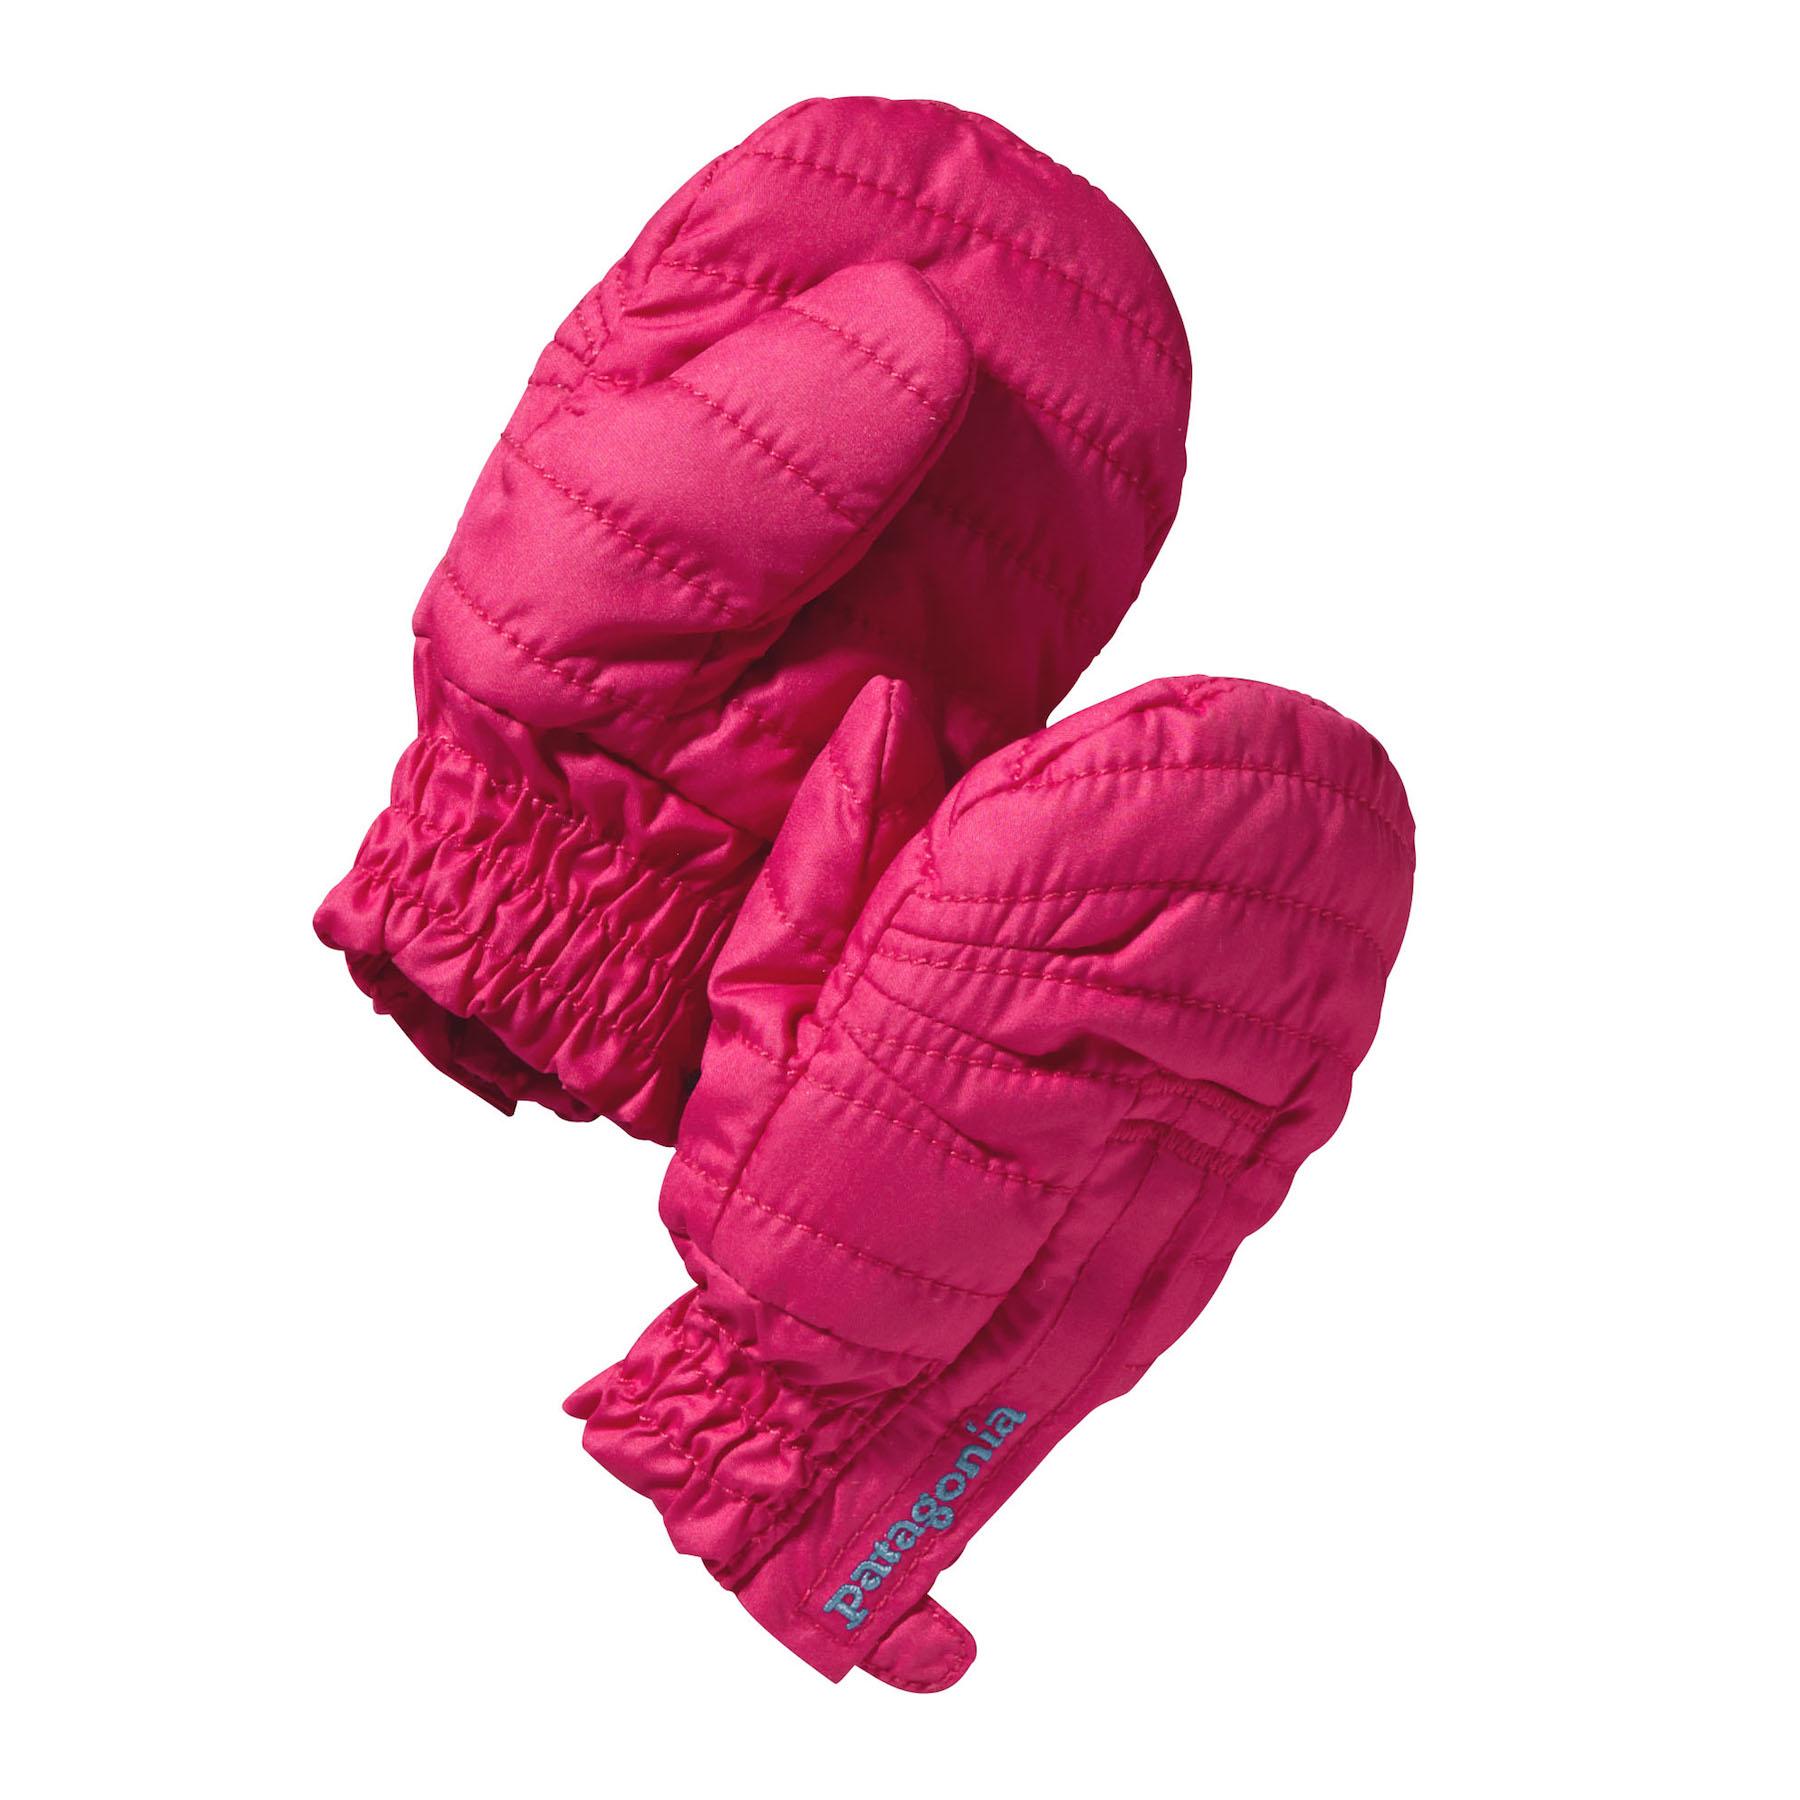 Patagonia - Baby Puff Mitts - Gloves - Kids